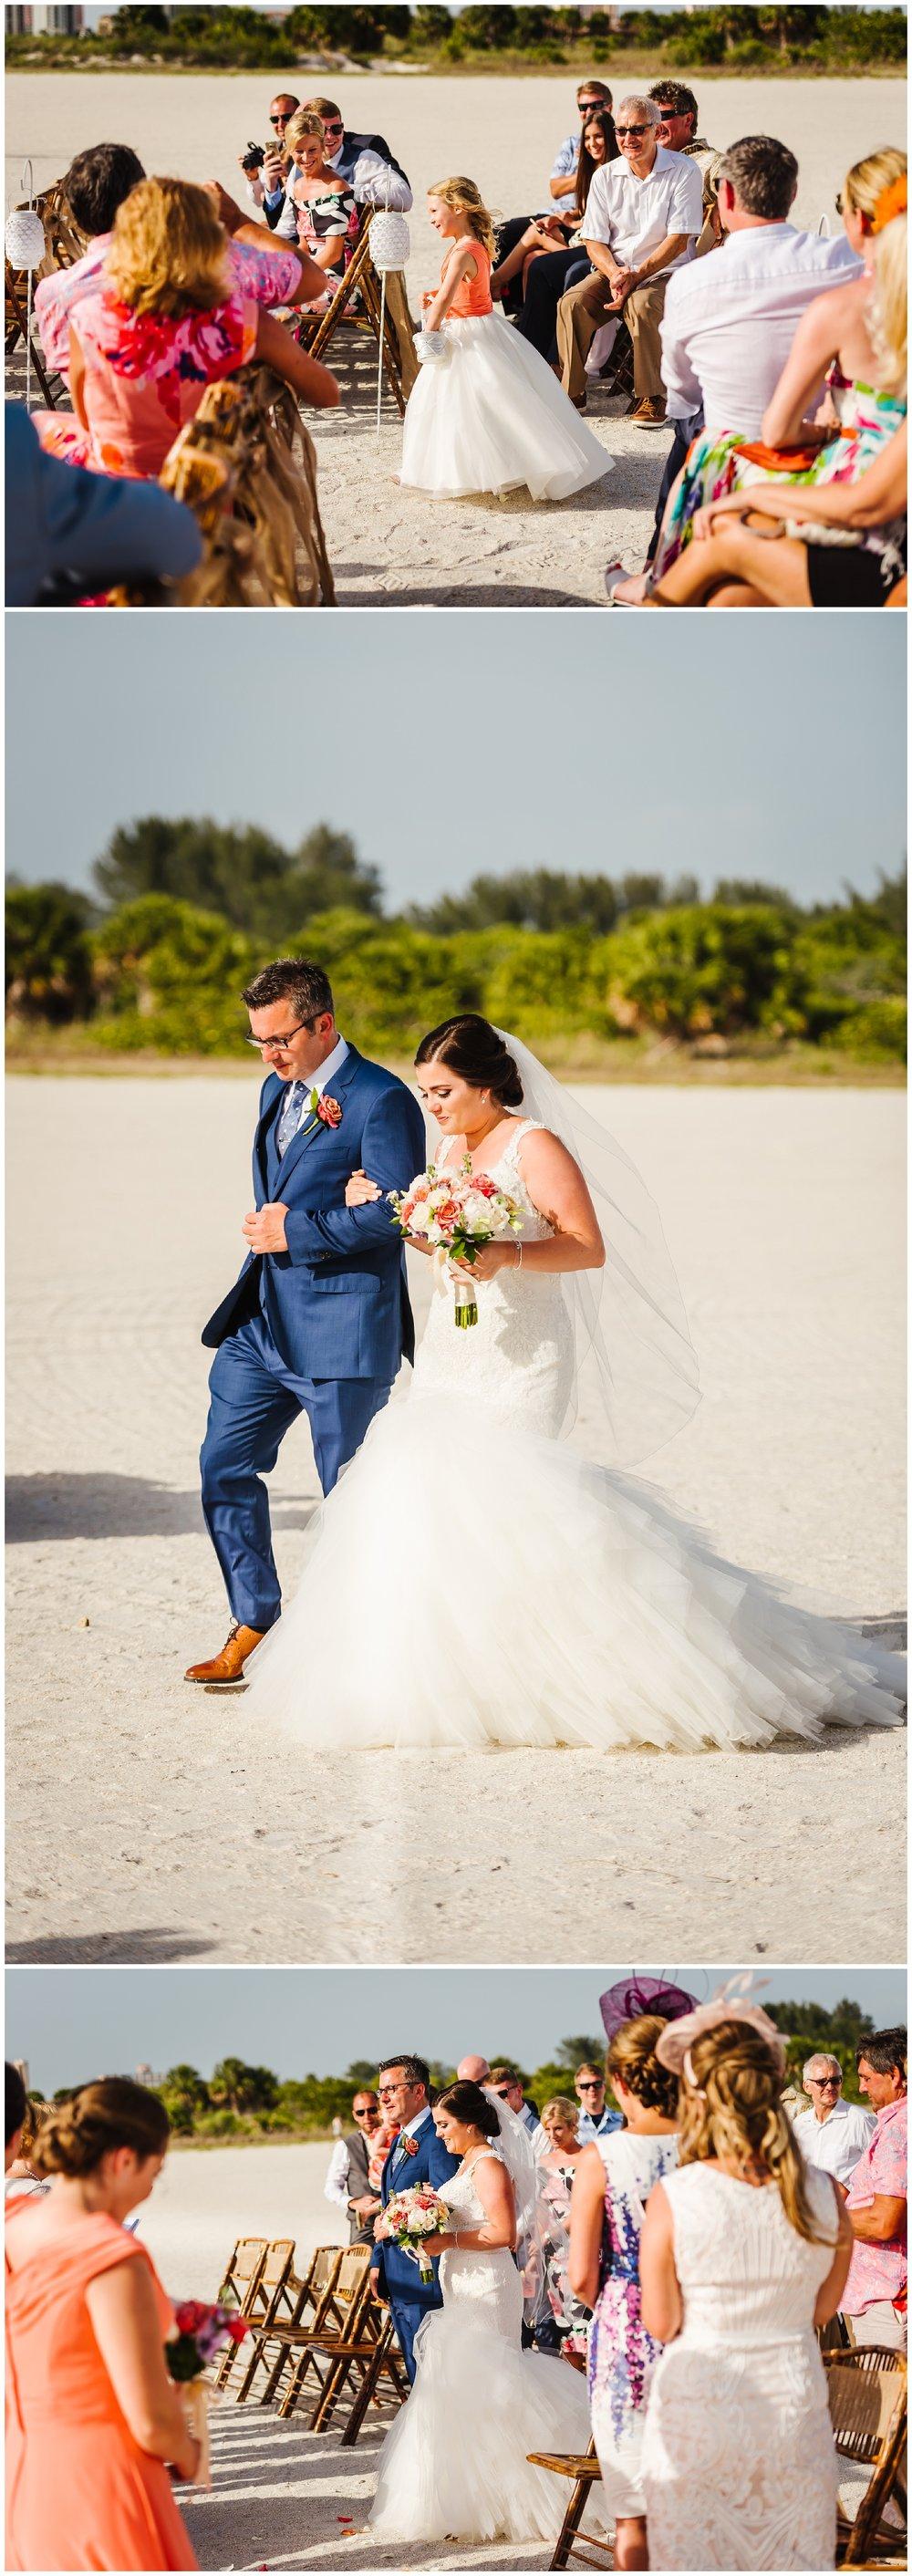 Clearwater-destination-wedding-photographer-jimmy-choo-yves-st-laurent-sunset_0083.jpg